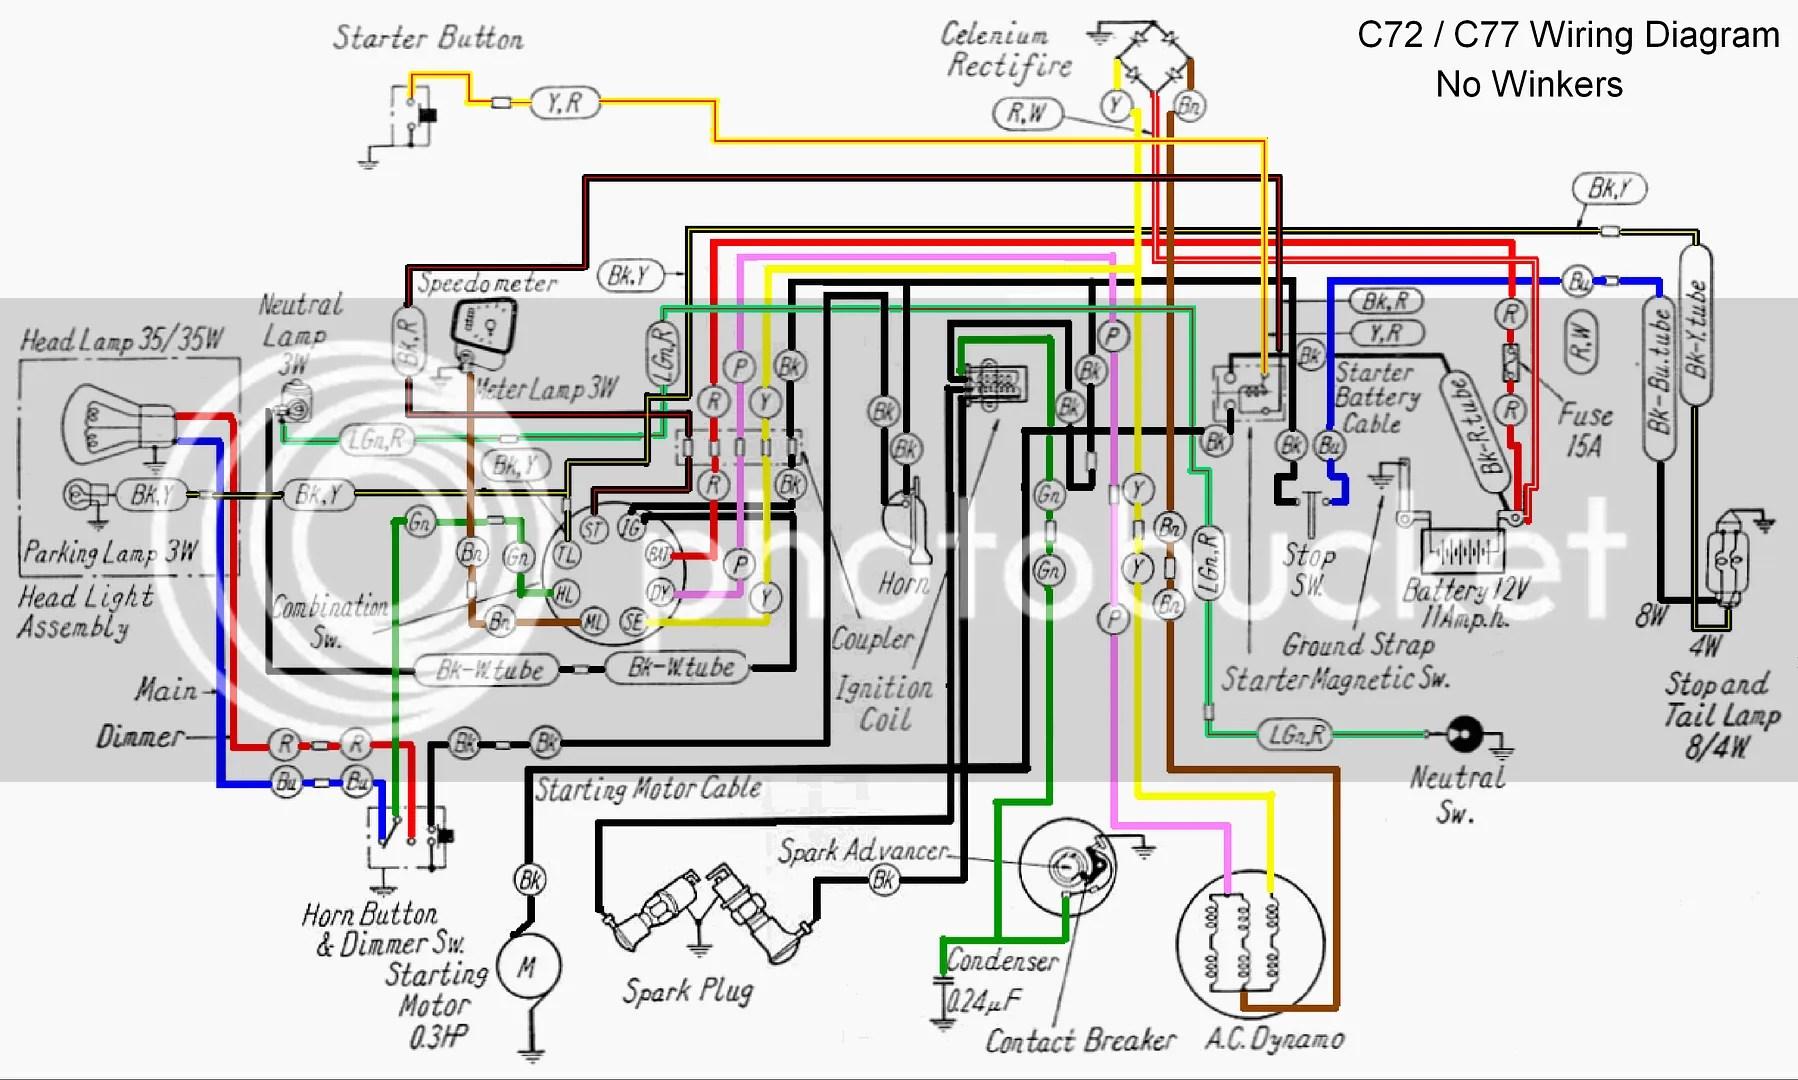 small resolution of honda cl70 wiring diagram wiring diagram todays honda z50 wiring diagram honda cl70 wiring diagram wiring